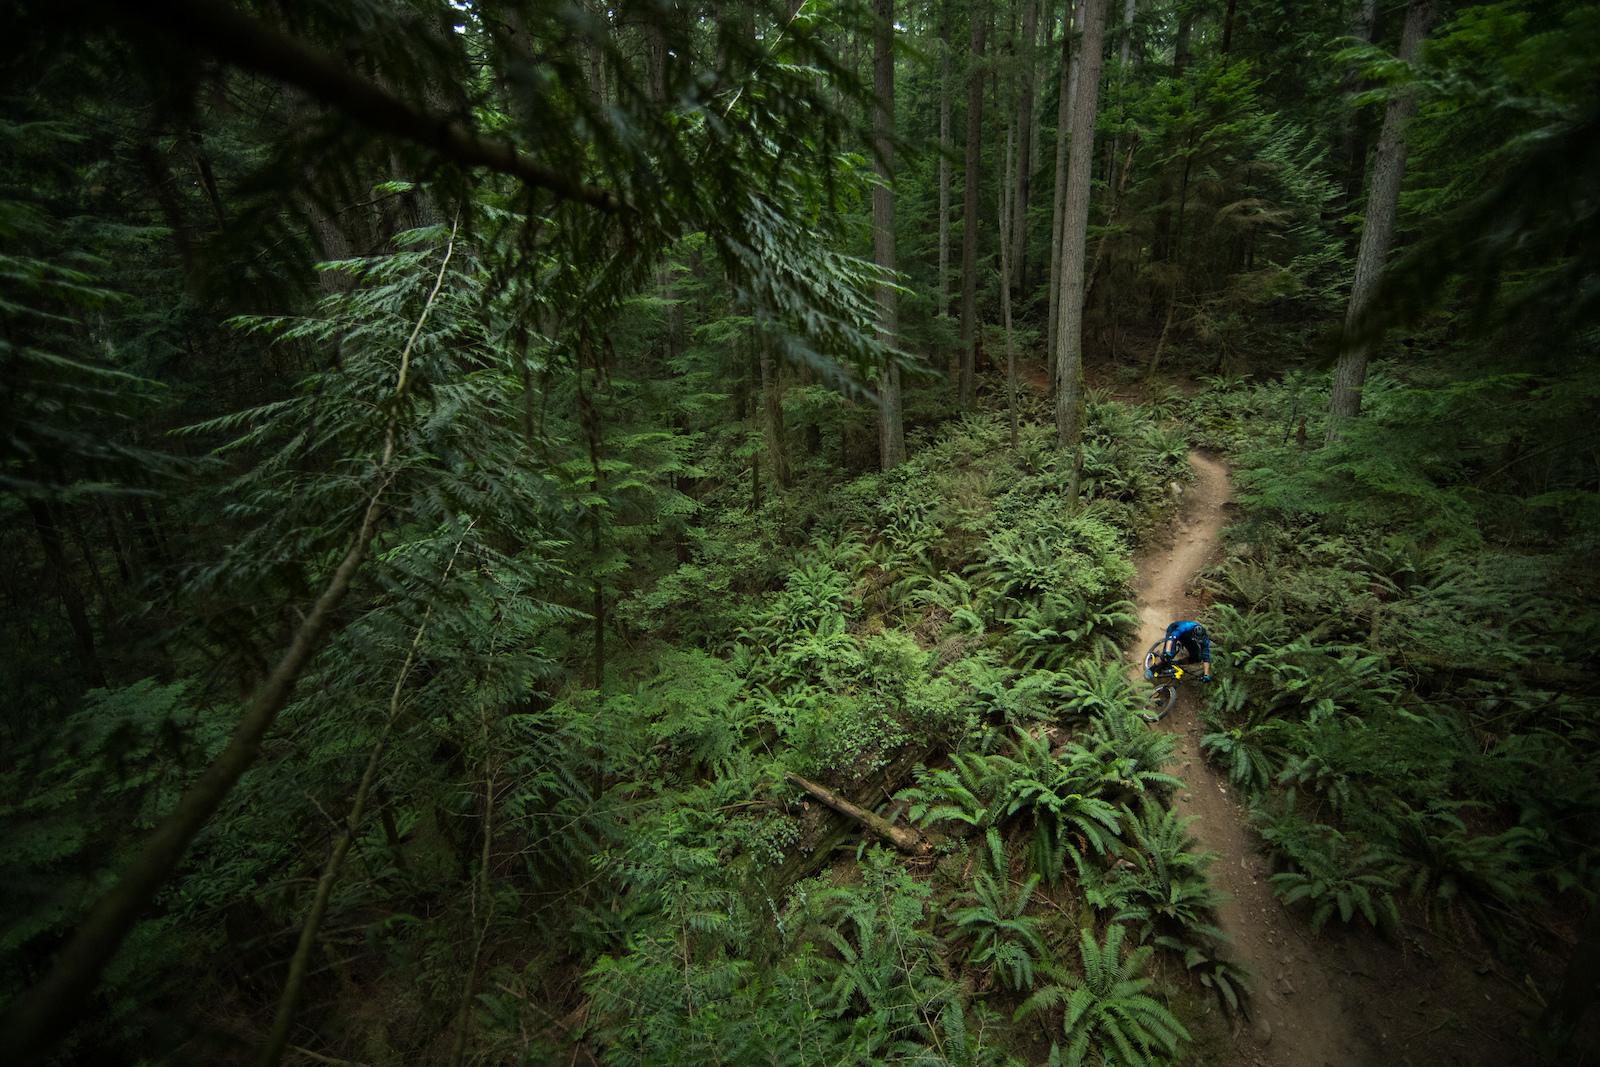 Thomas Vanderham on Mount Seymour, British Columbia